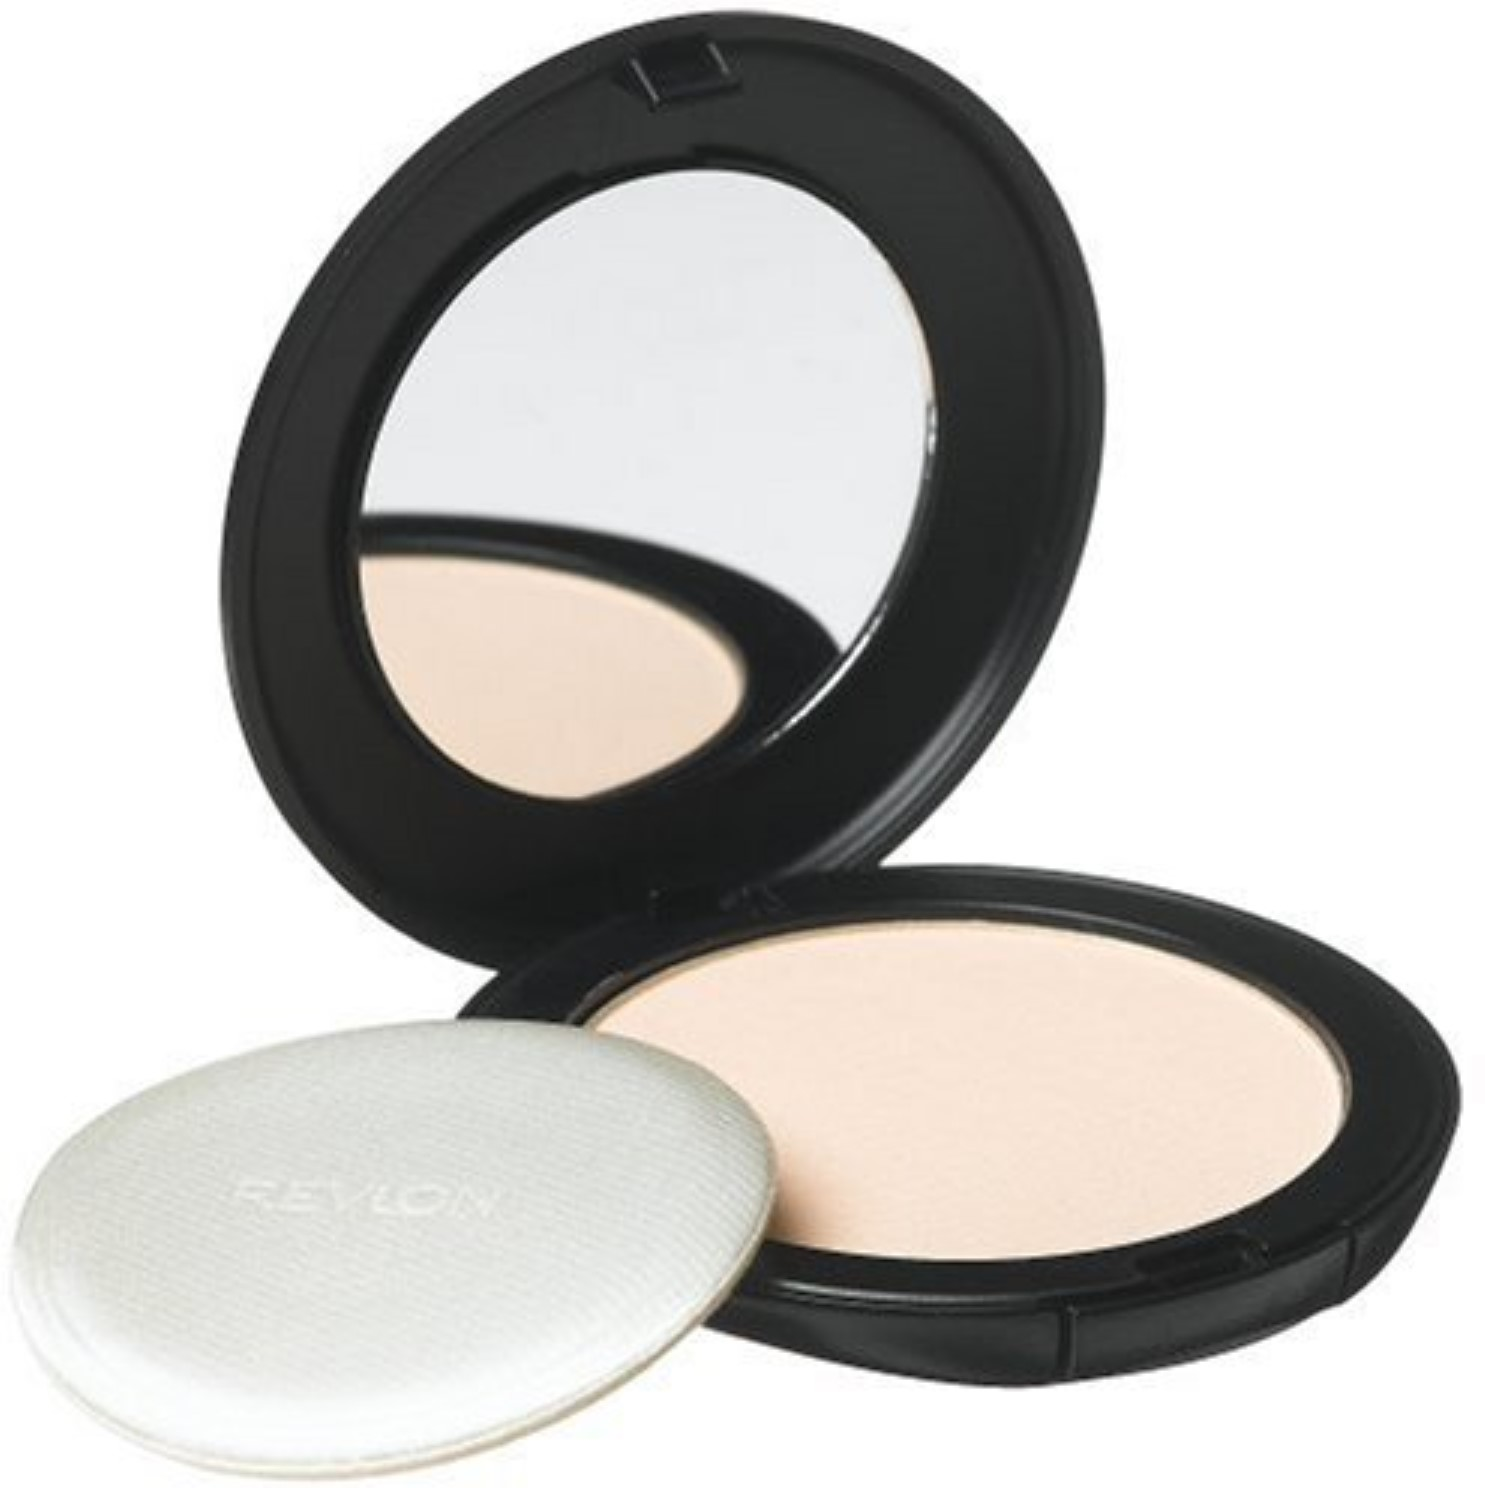 Revlon ColorStay Pressed Powder, Fair [810] 0.3 oz